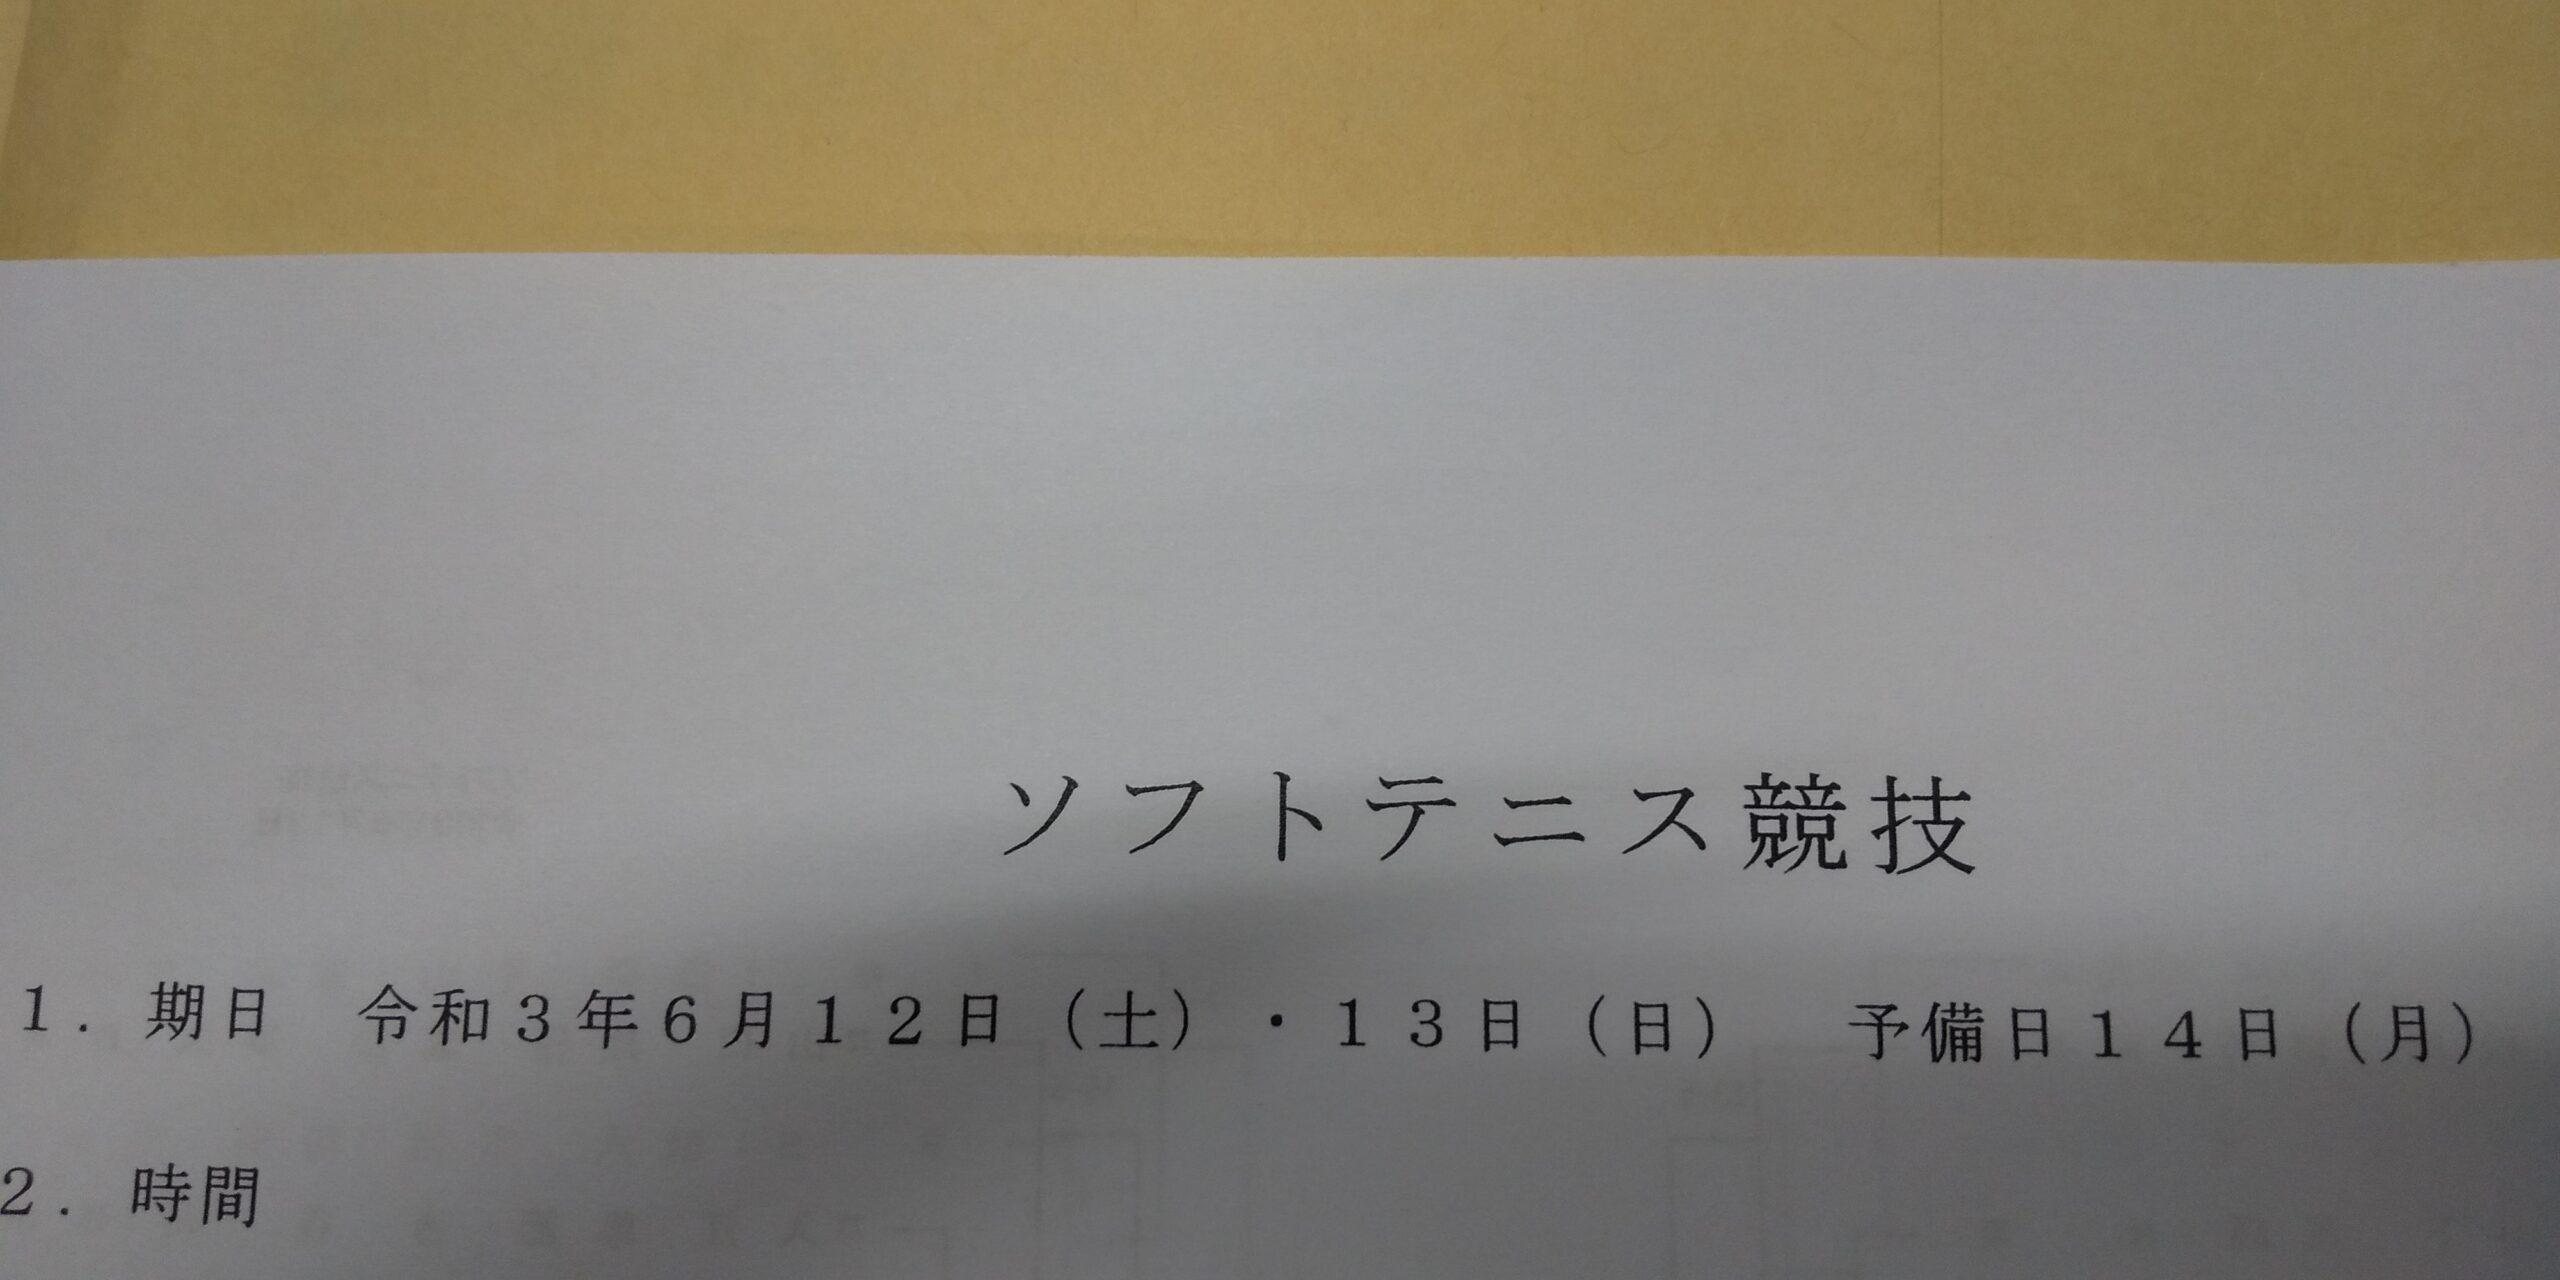 長崎市中総体ソフトテニス競技 雨天延期